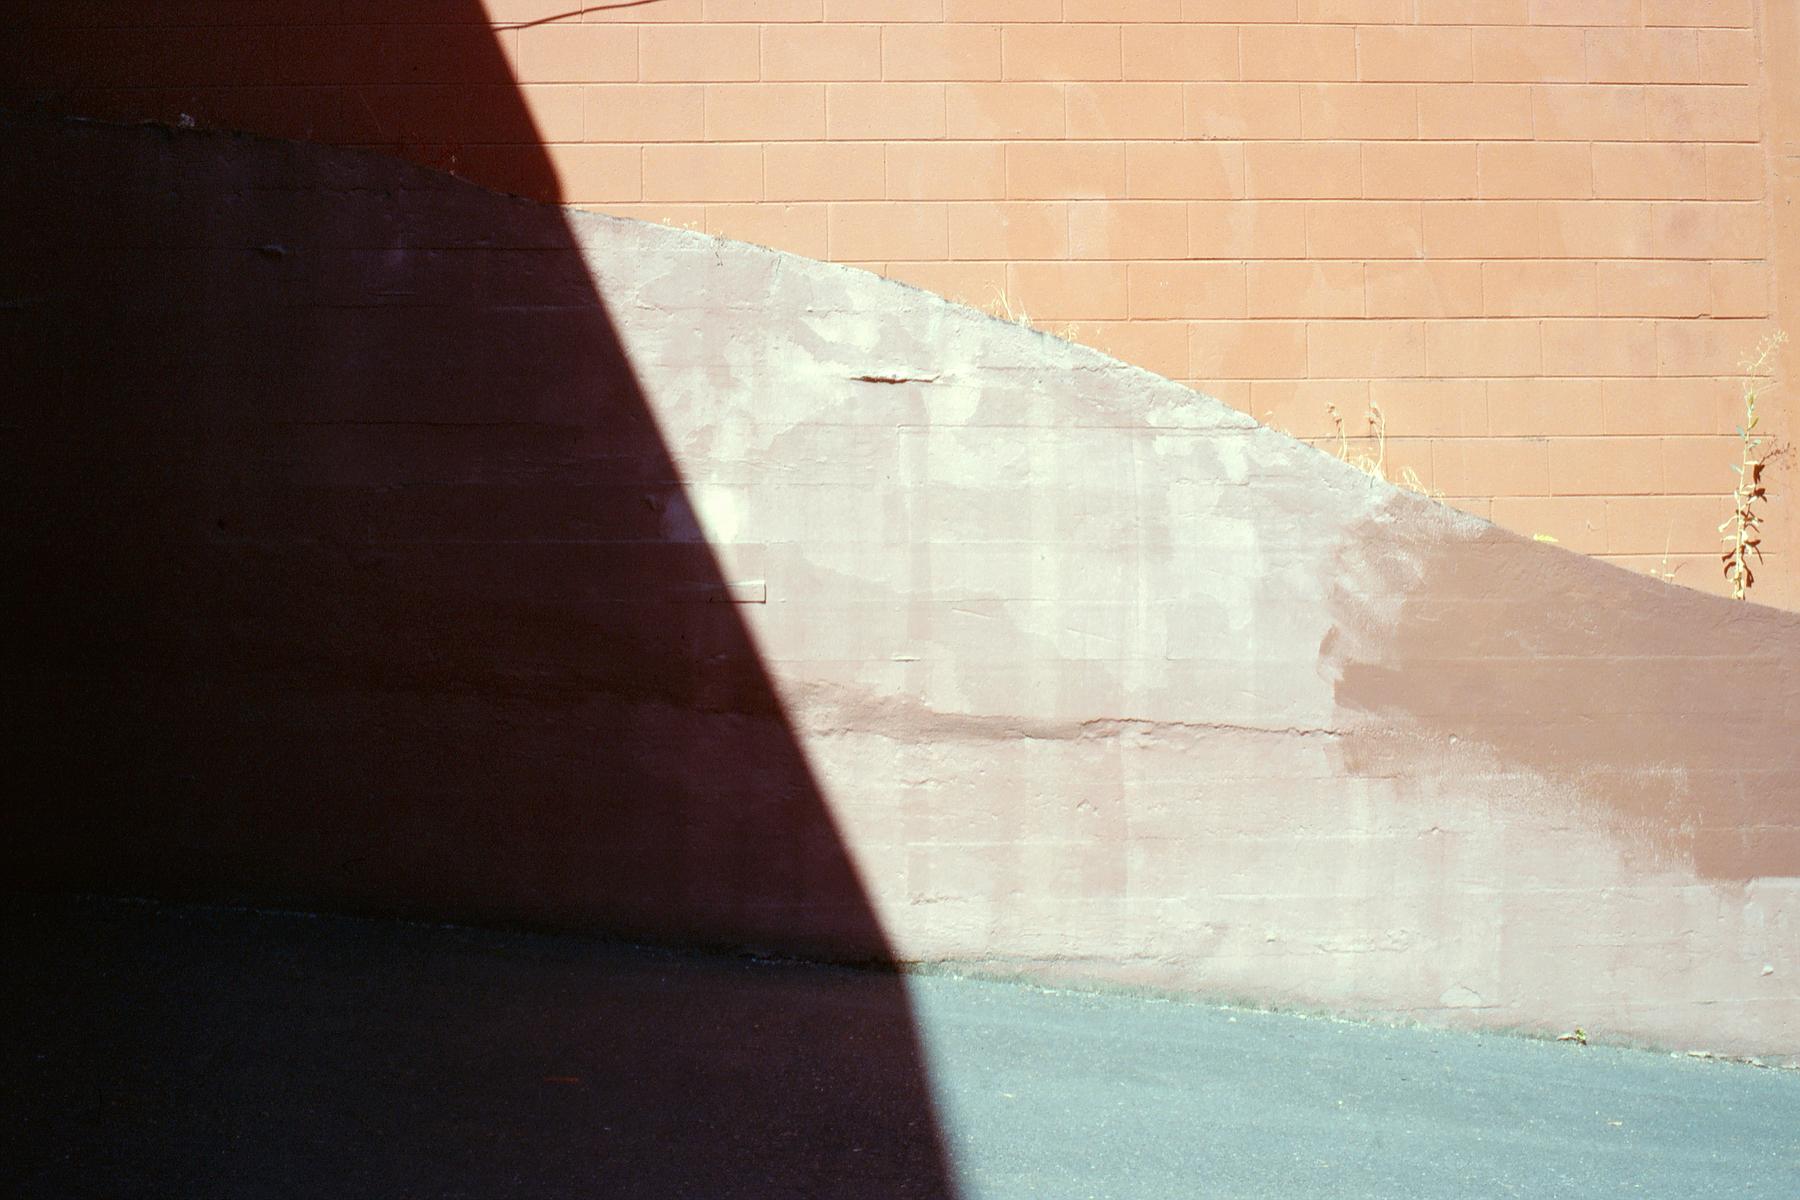 Untitled | Contax G2 | Kodak Elitechrome 100 | Colton Allen